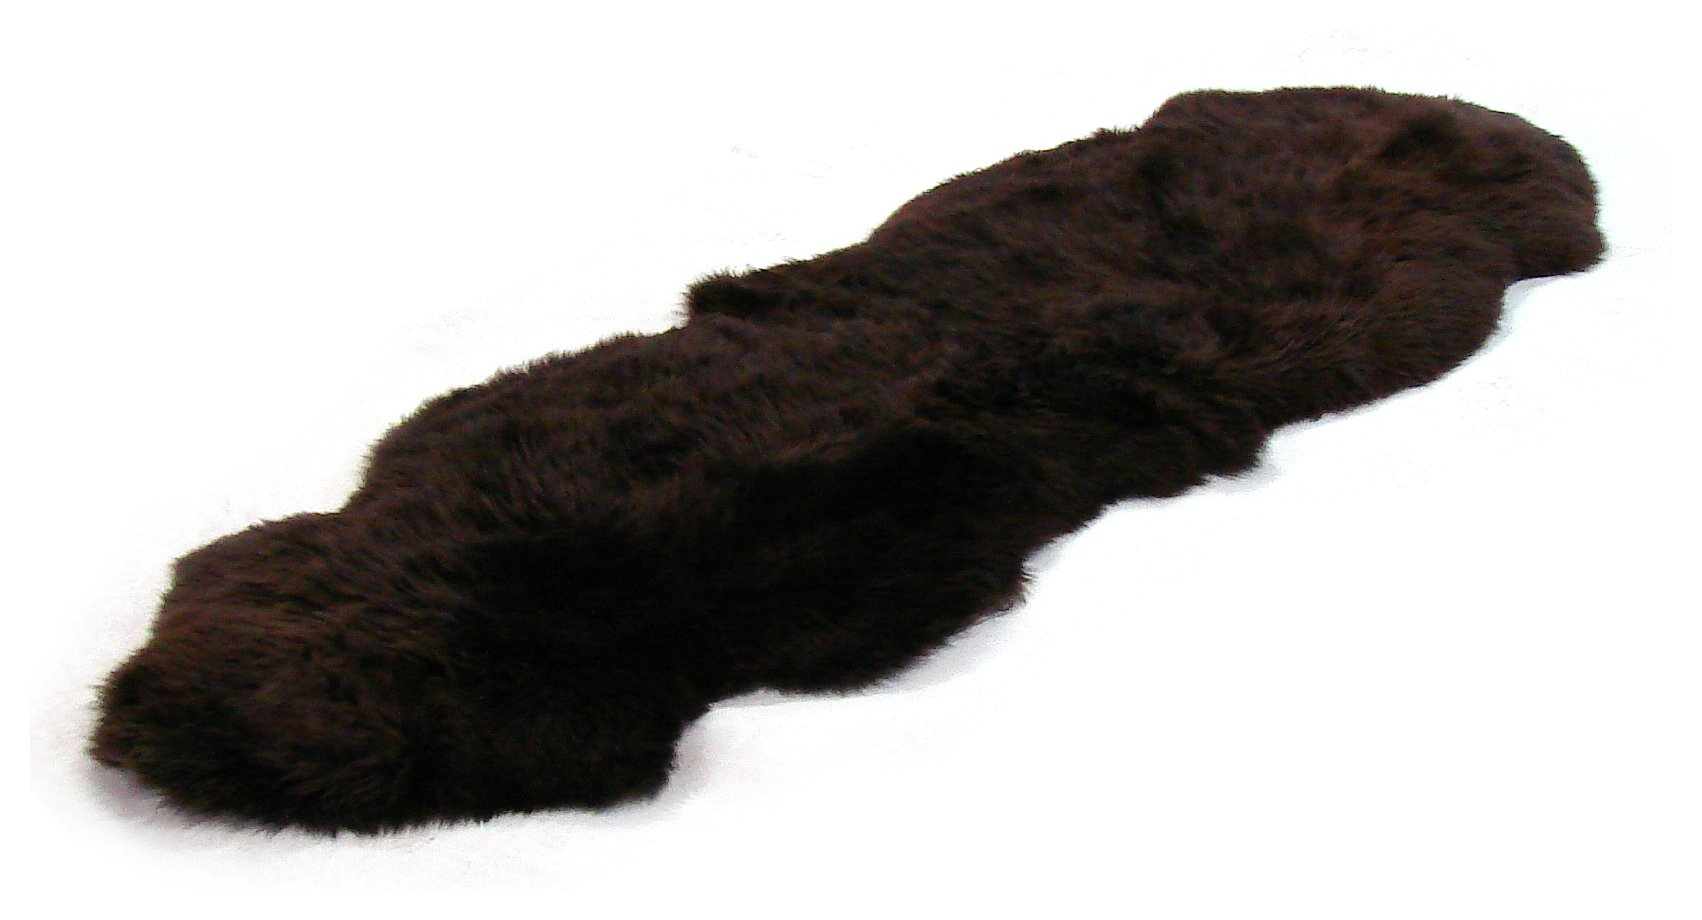 Image of Bowron Sheepskin Longwool Rug 180 x 60cm - Dark Brown.